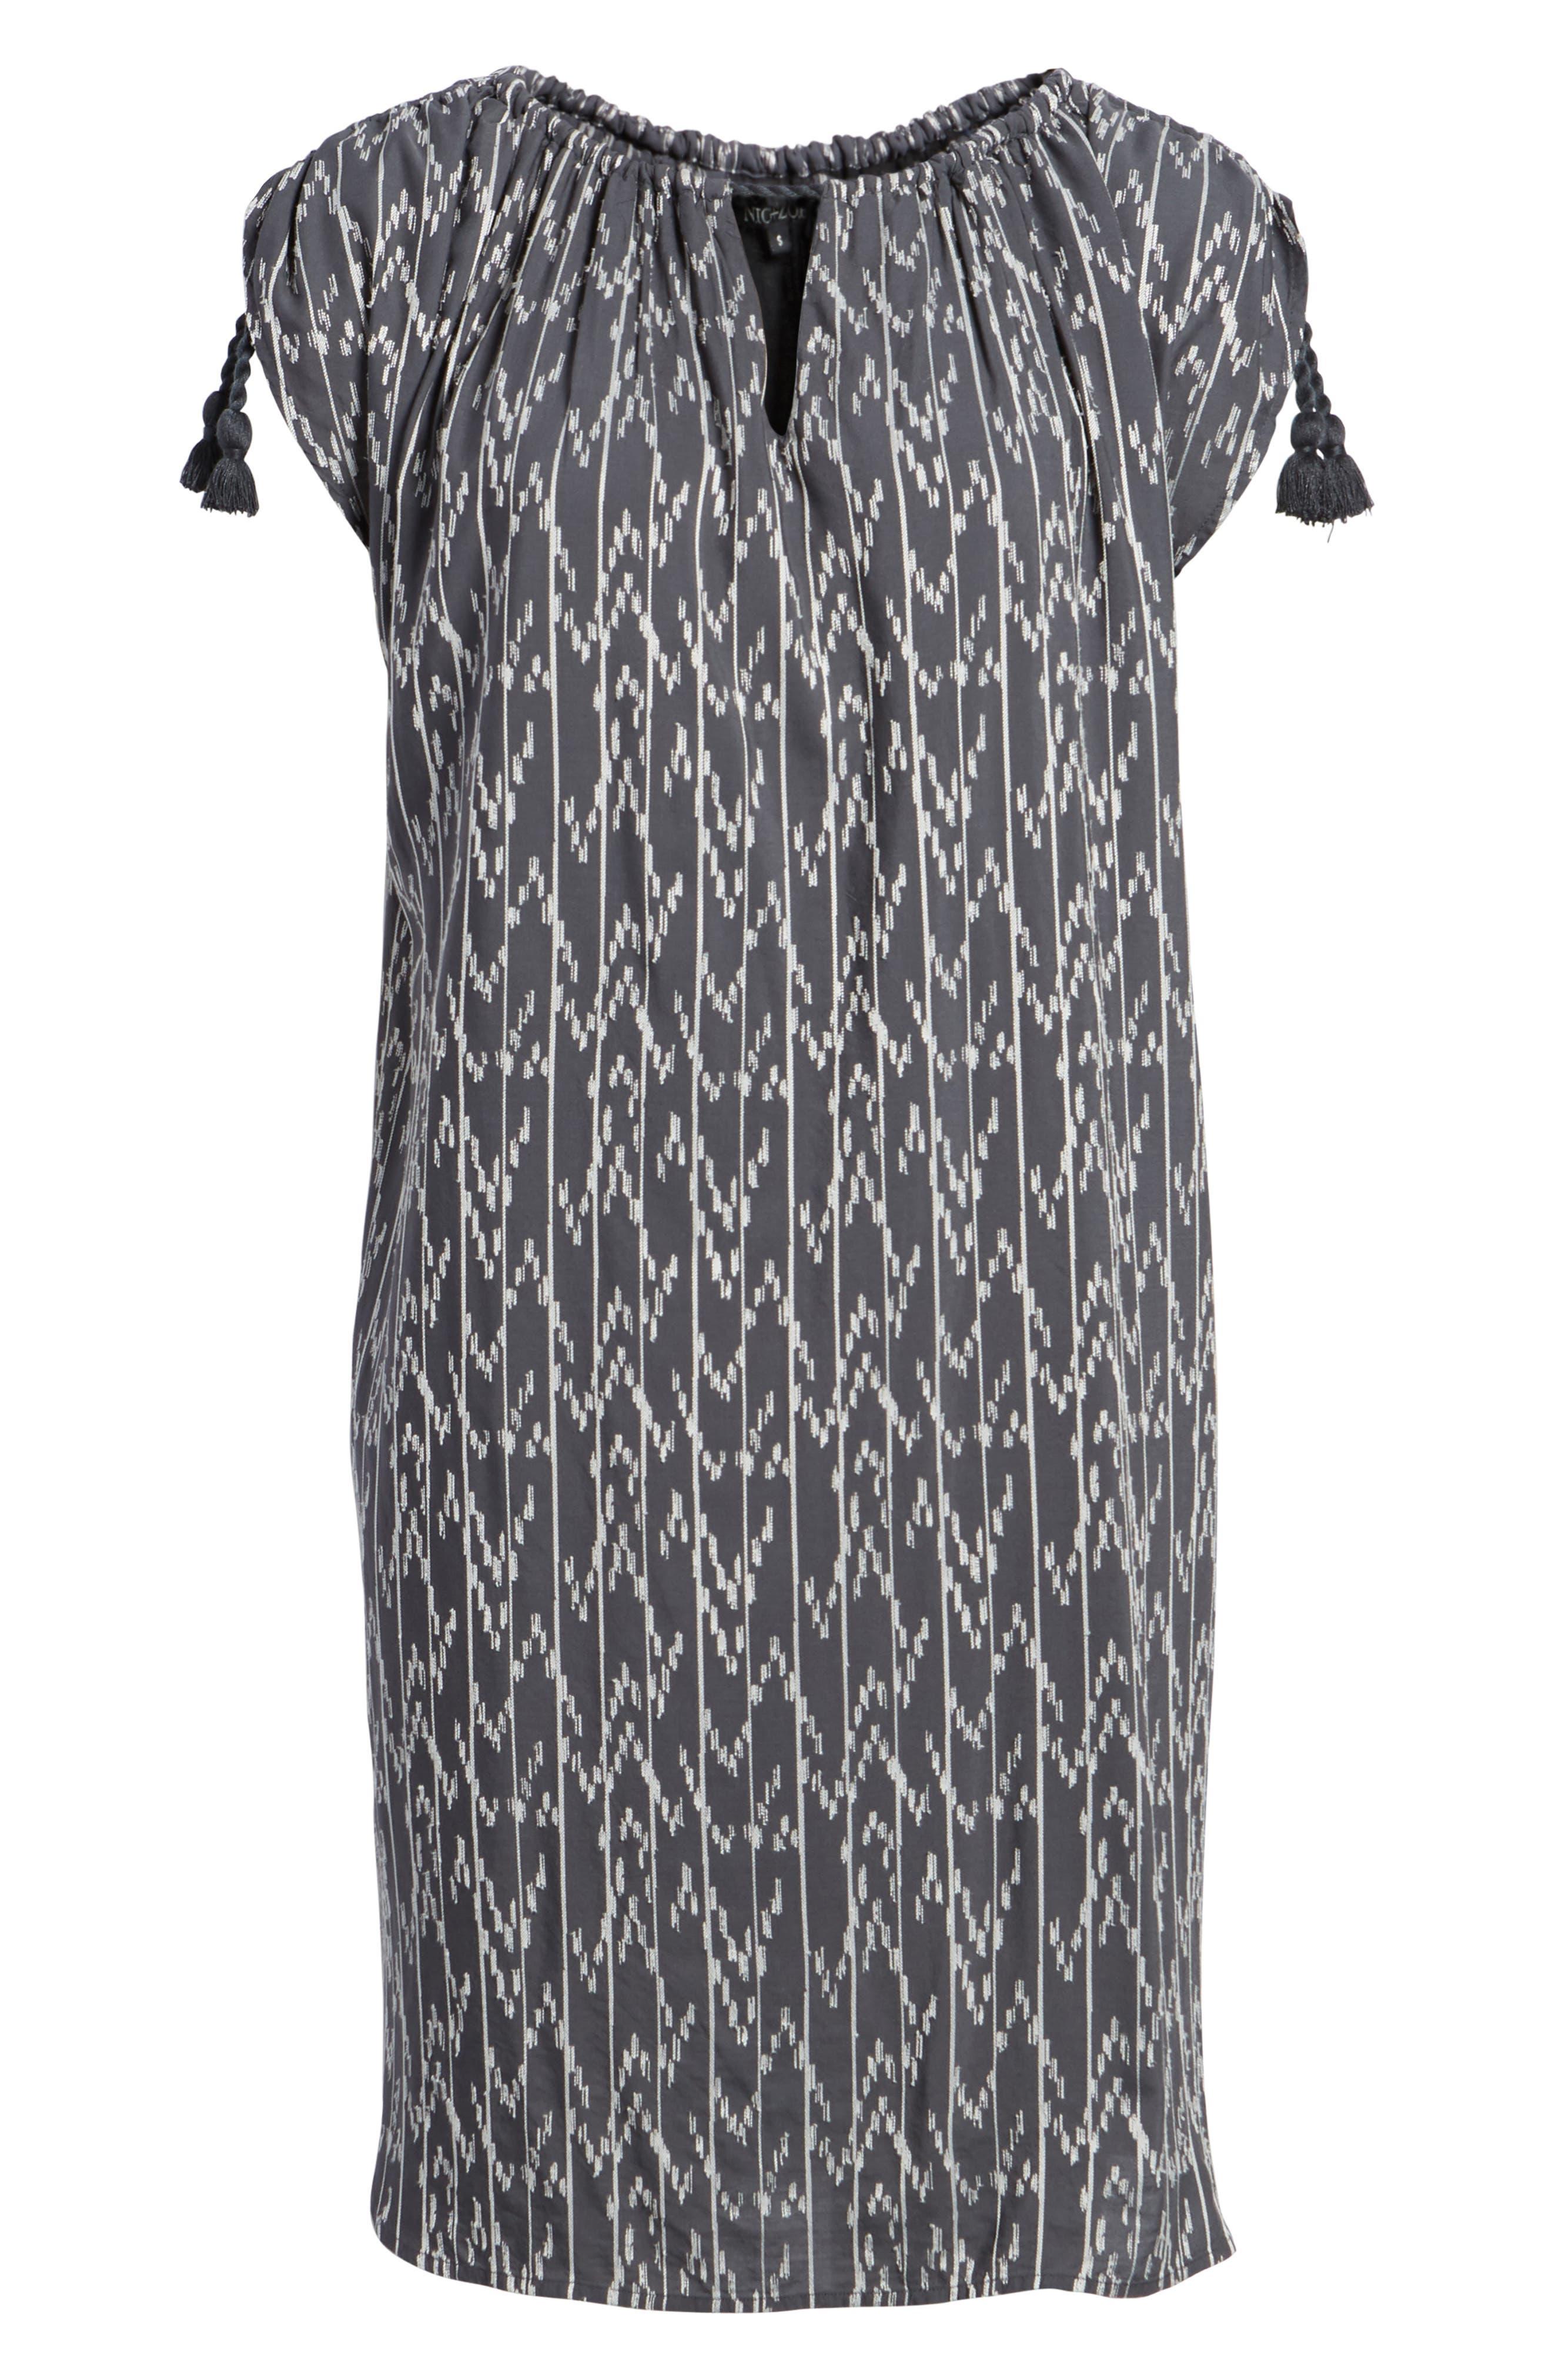 Market Embroidered Shirt Dress,                             Alternate thumbnail 7, color,                             Multi